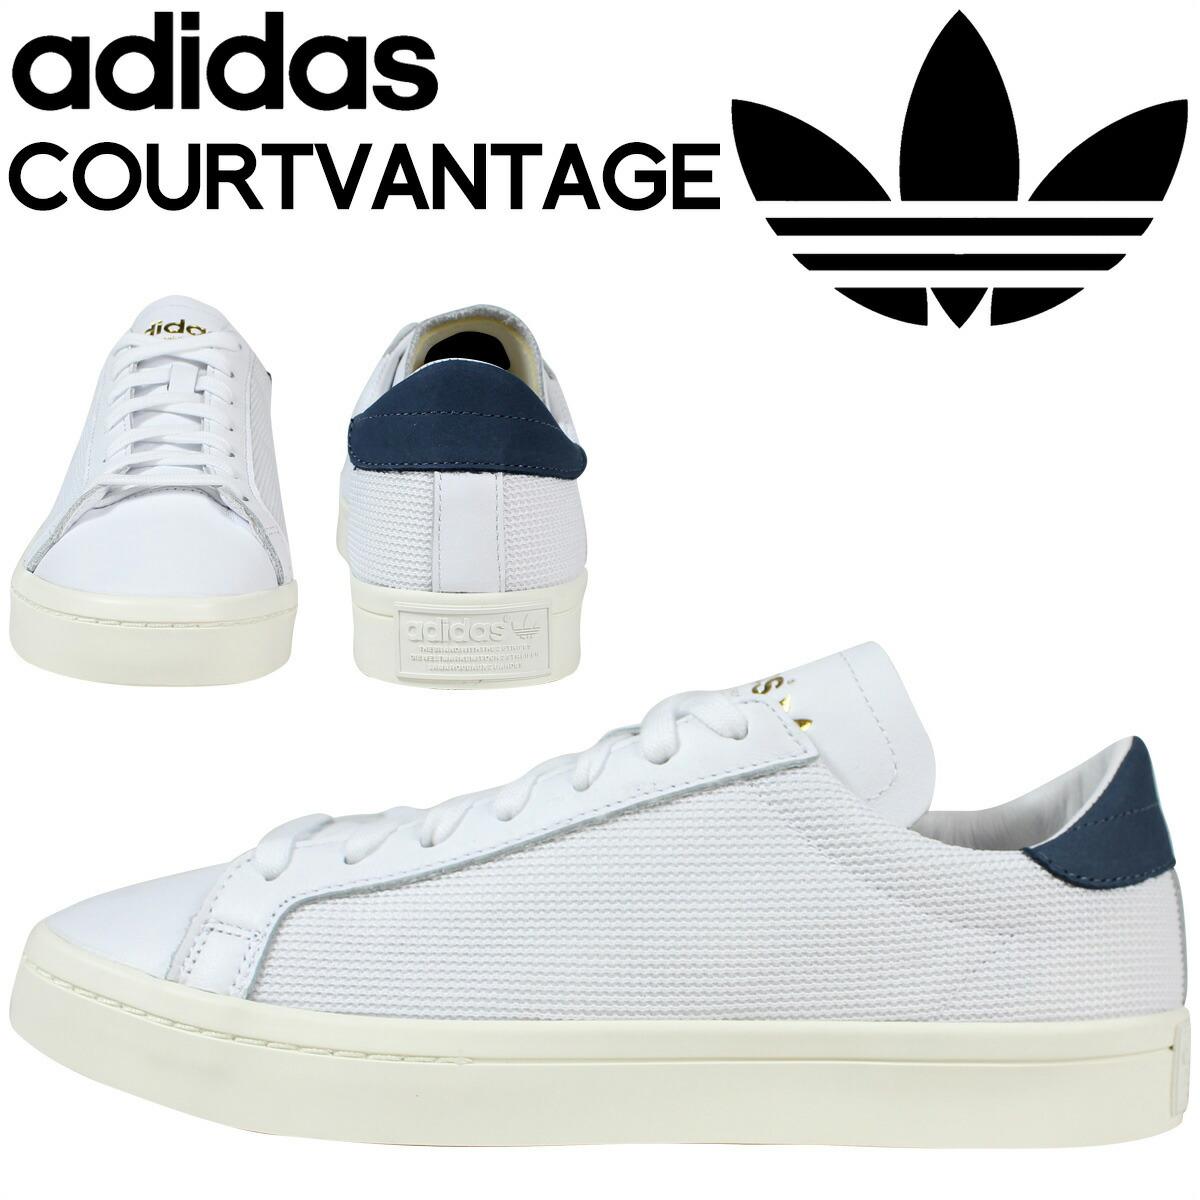 Adidas Originals Court Vantage White